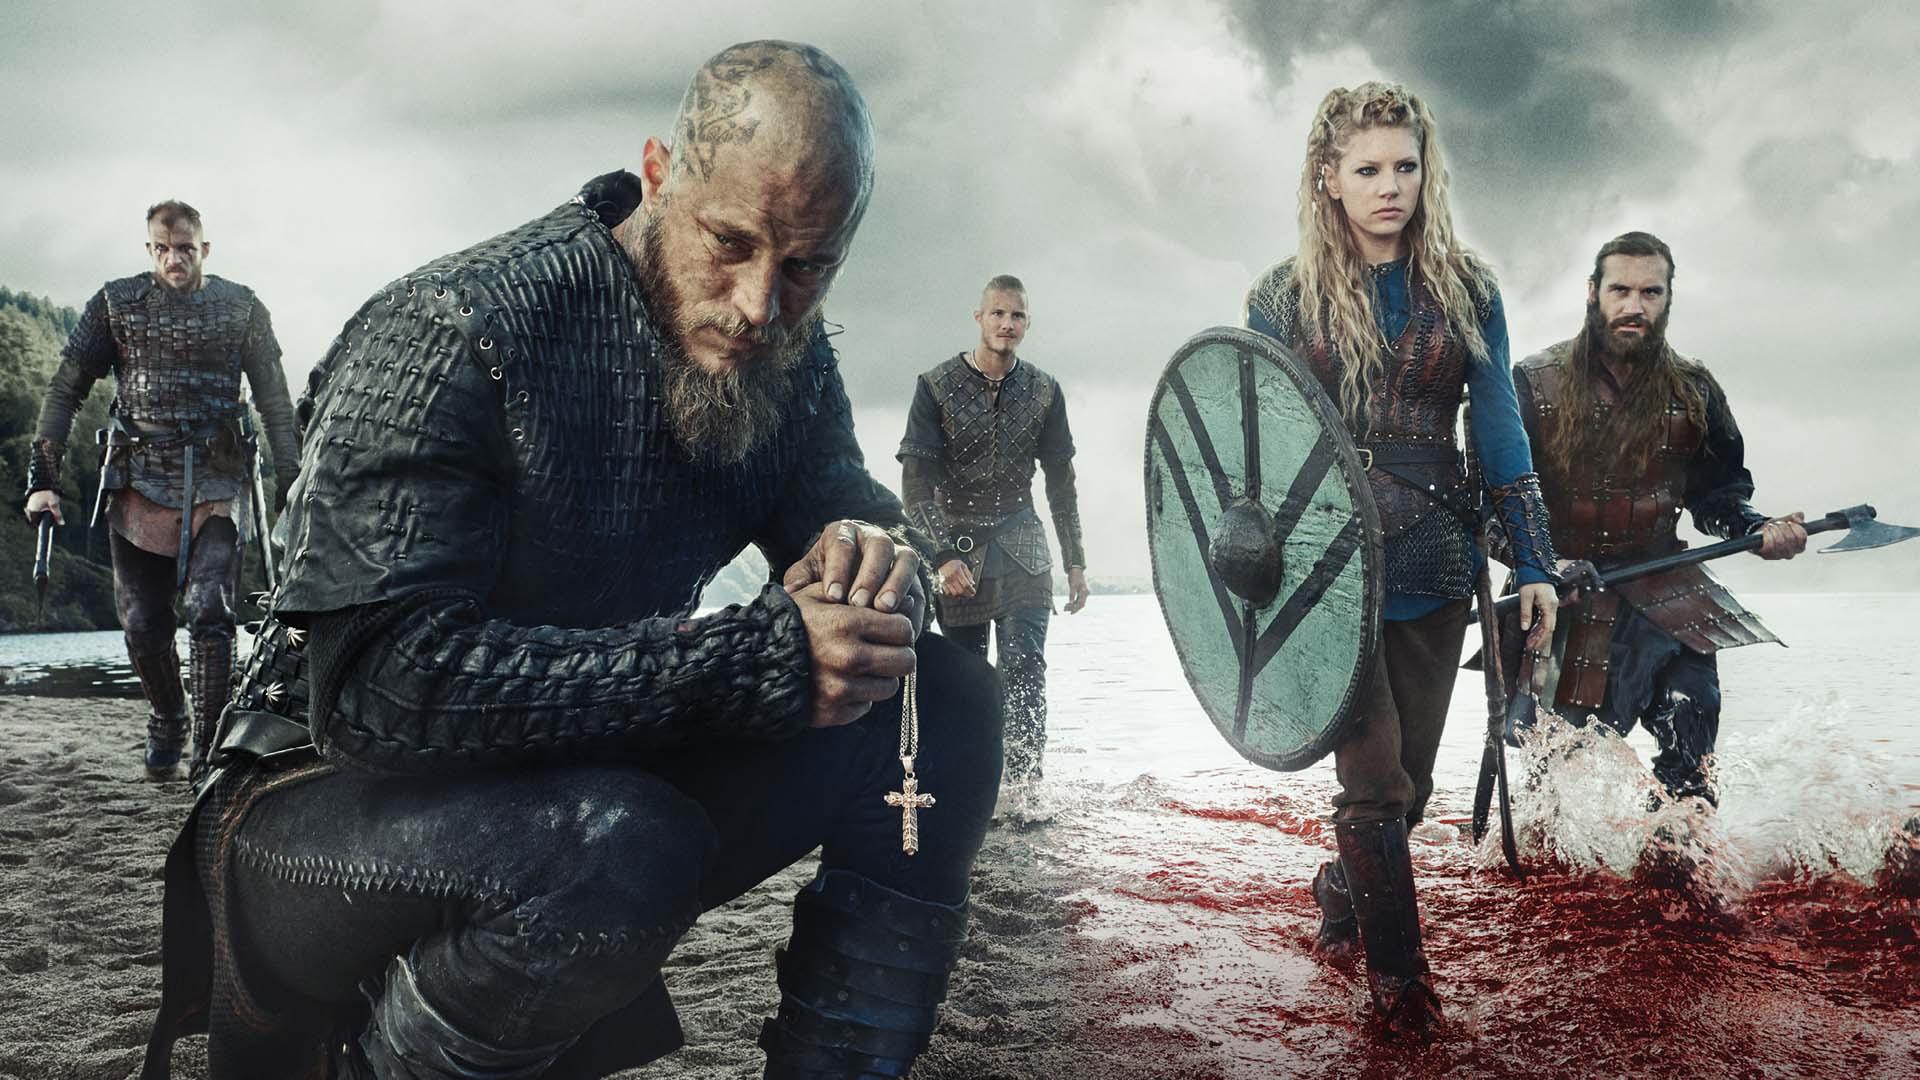 watch vikings season 5 episode 11 online free watch movies